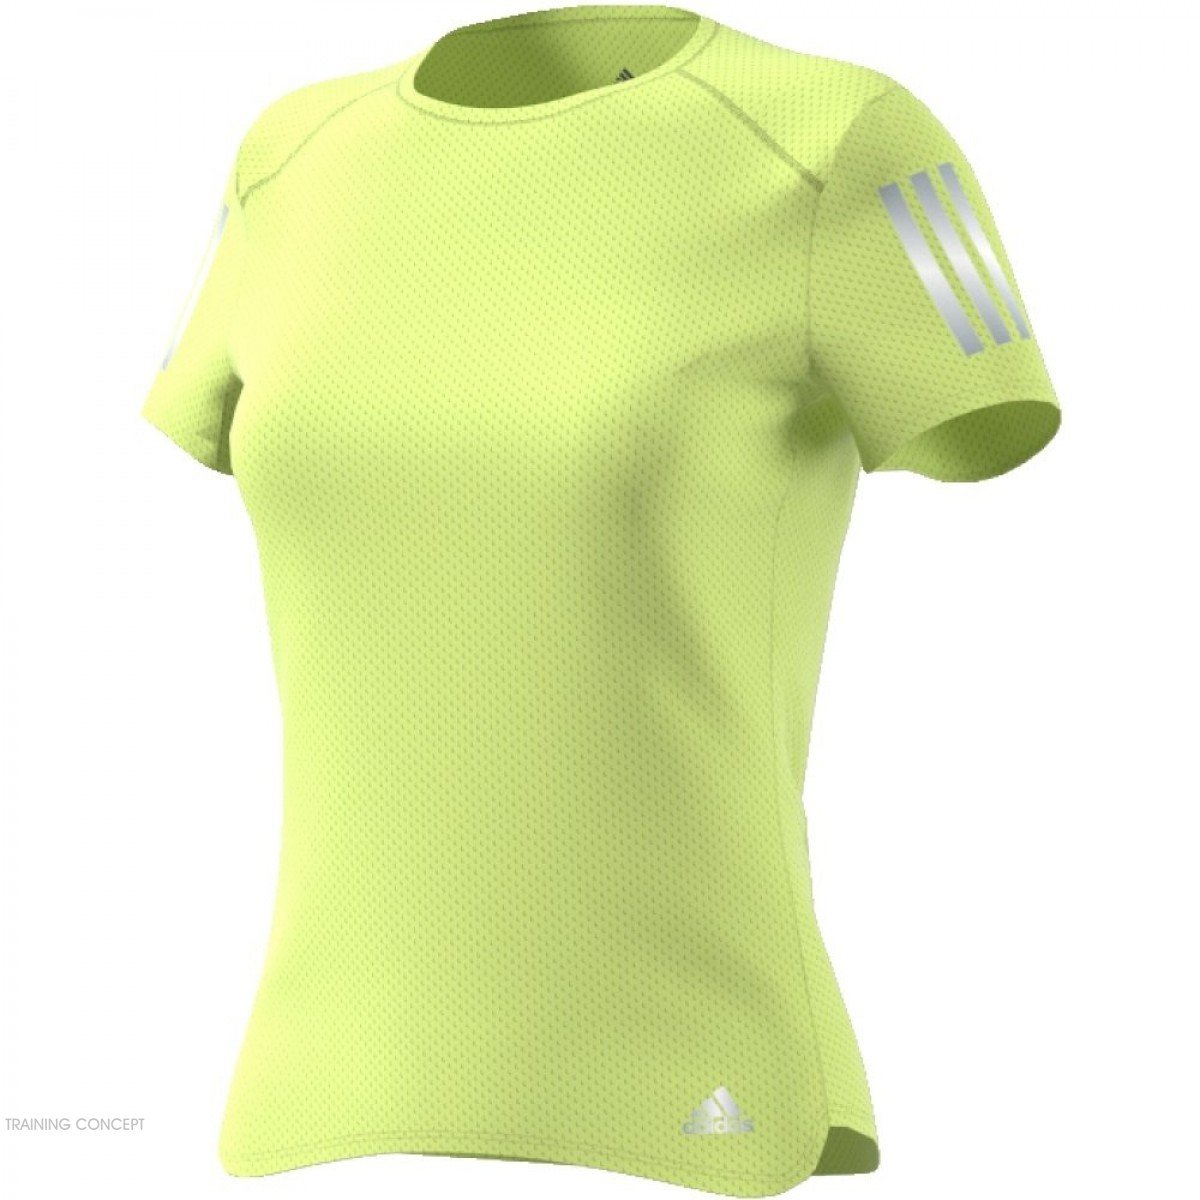 Tee shirt Adidas Training Femme Adidas Femmes